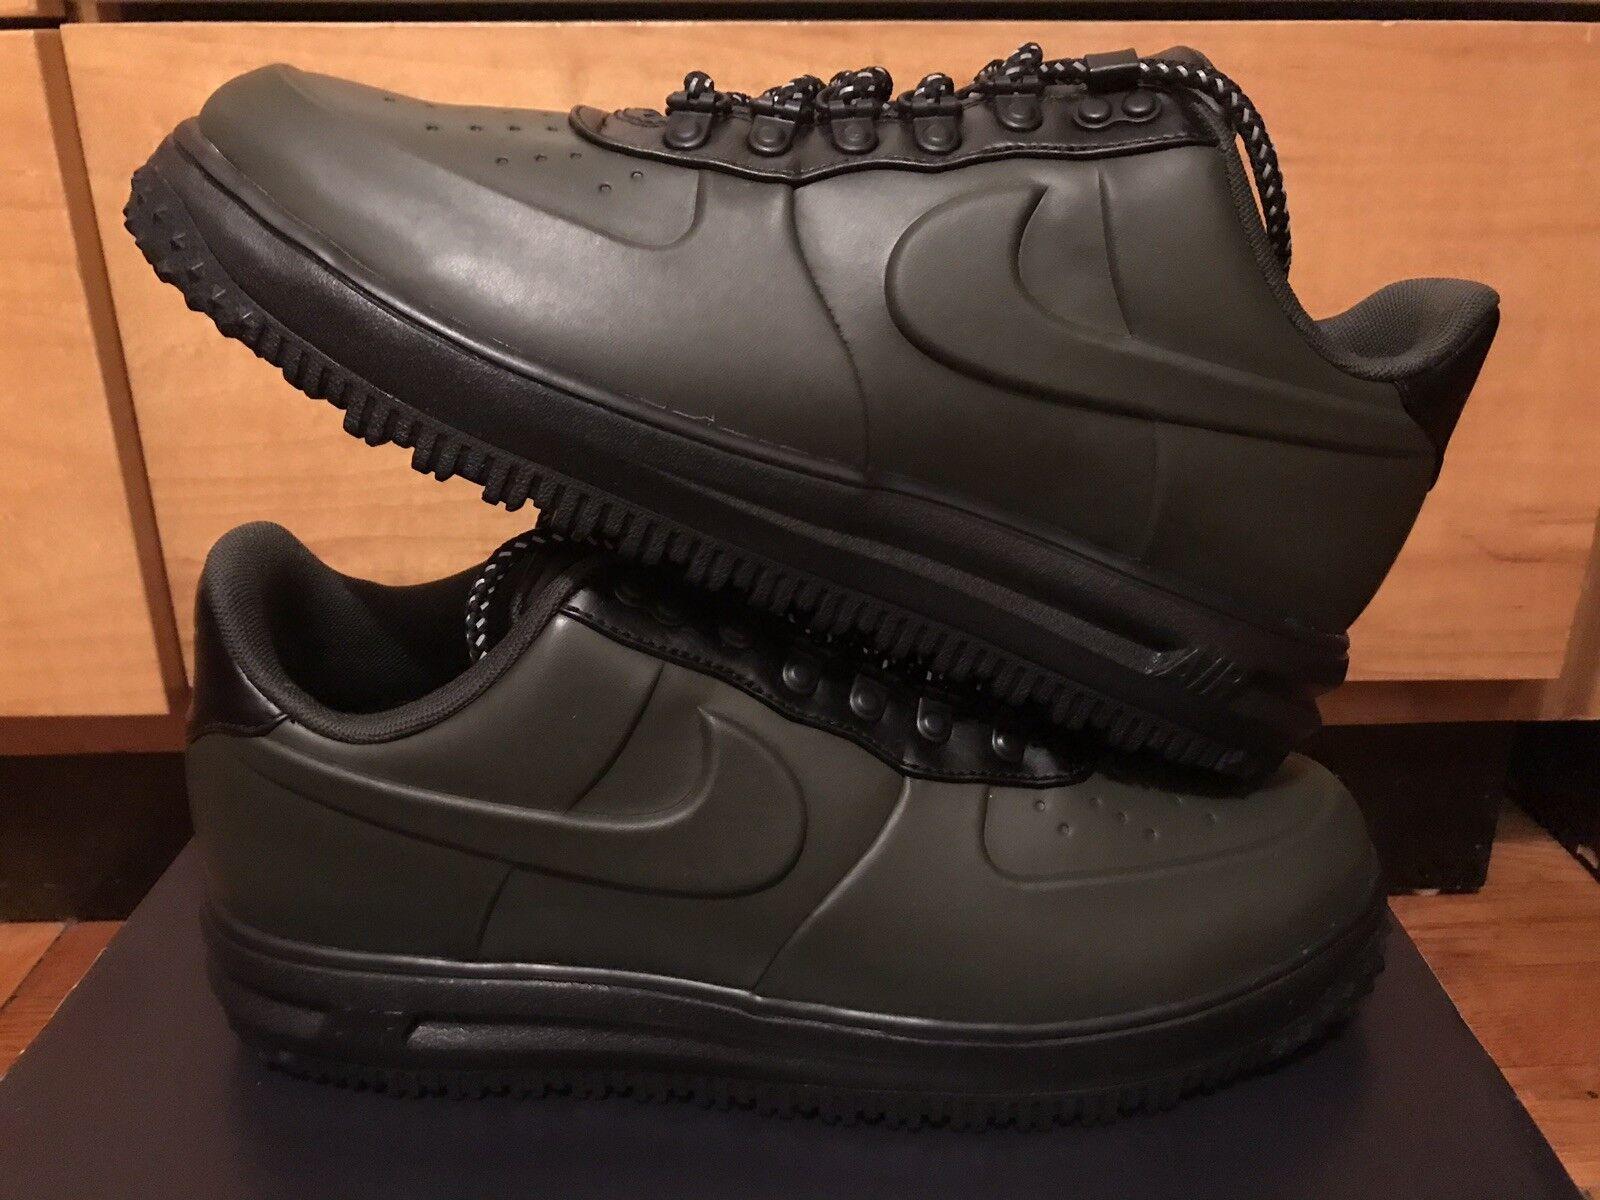 e1479b300c92cc 140 Nike Duckboot Mens Size 11.5 Boots Black Sequoia Green AA1125 300 Rare